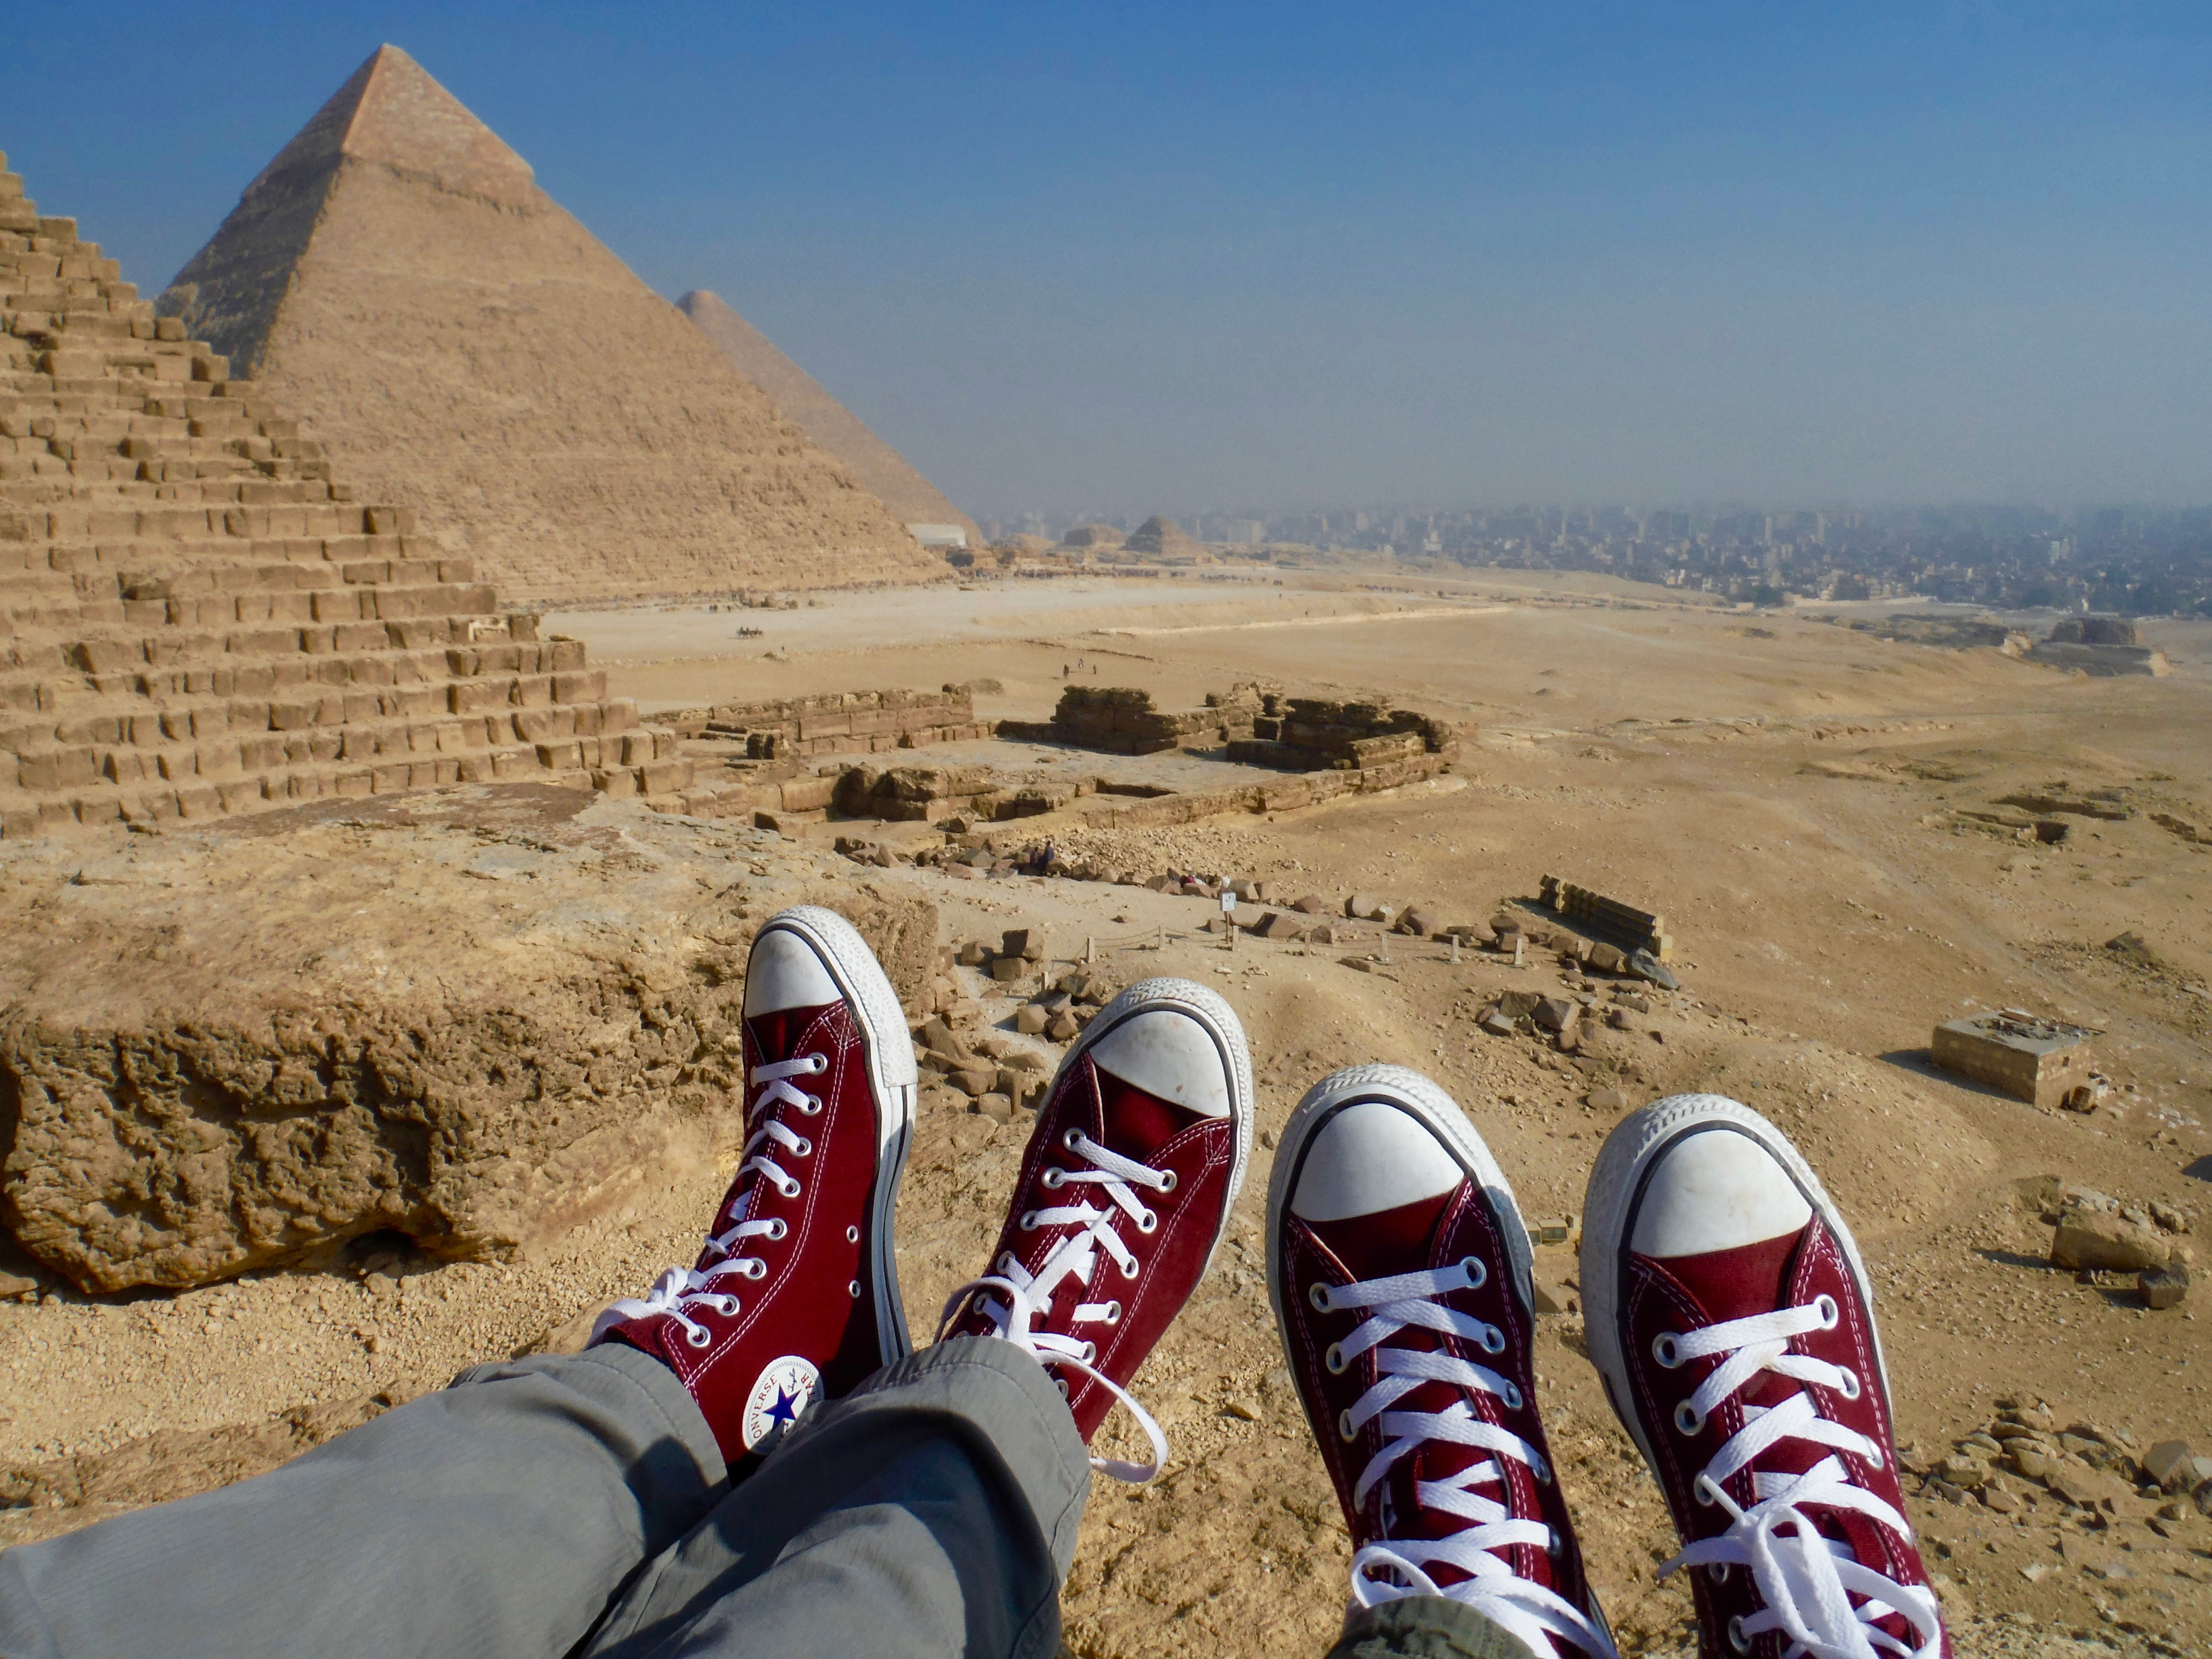 December 2015 - Giza Pyramid Complex, Giza, Egypt